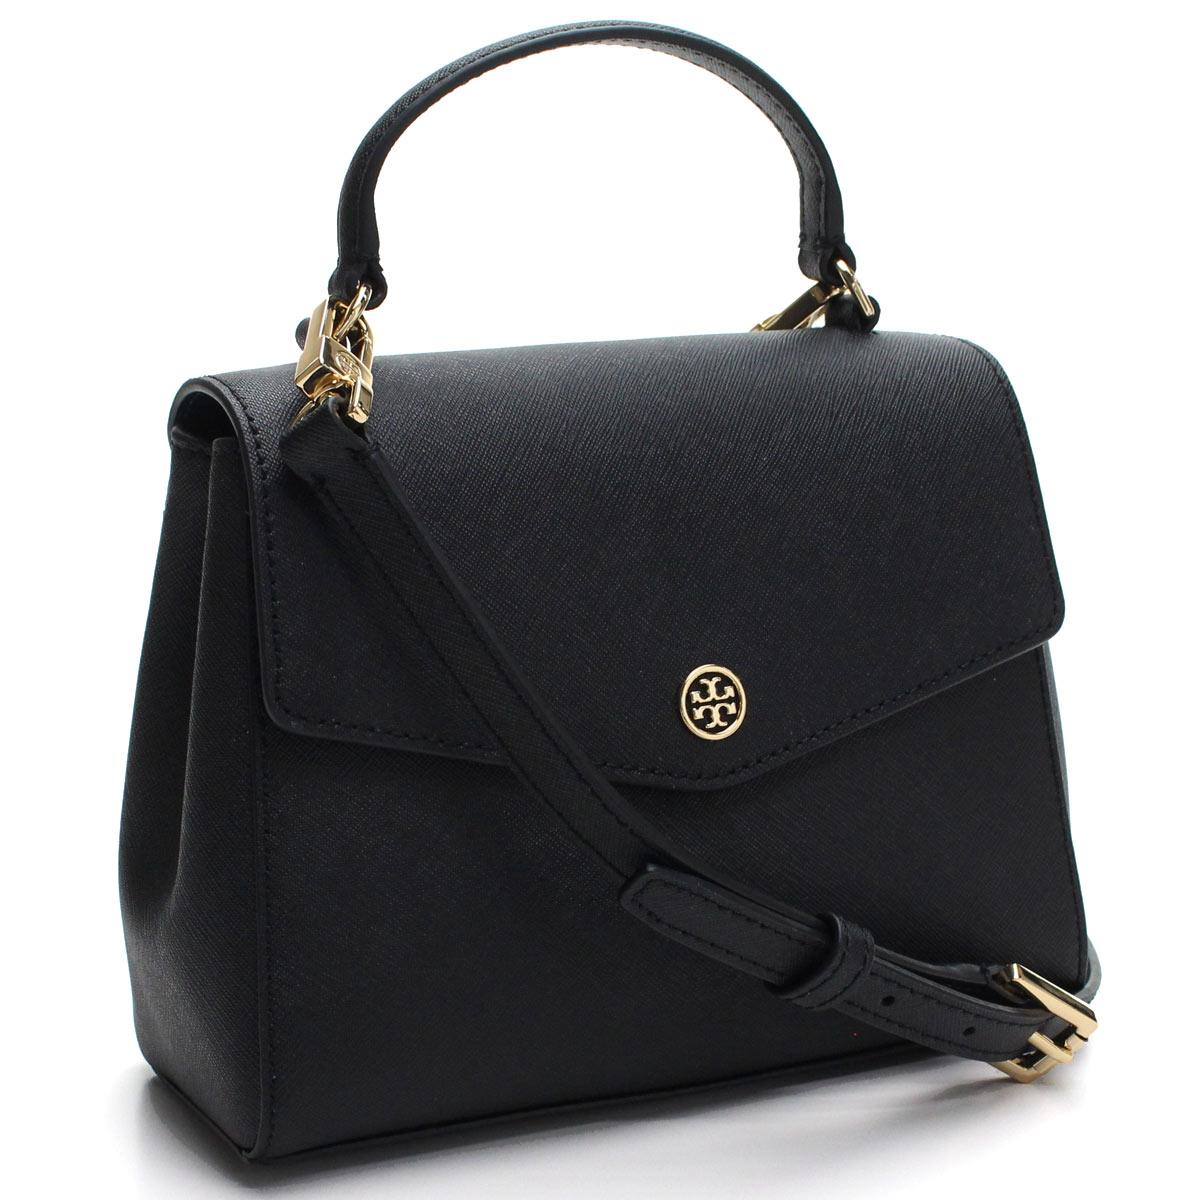 Hit The Total Brand Whole Tolly Birch Tory Burch Robinson Handbag 49686 001 Black Rakuten Global Market